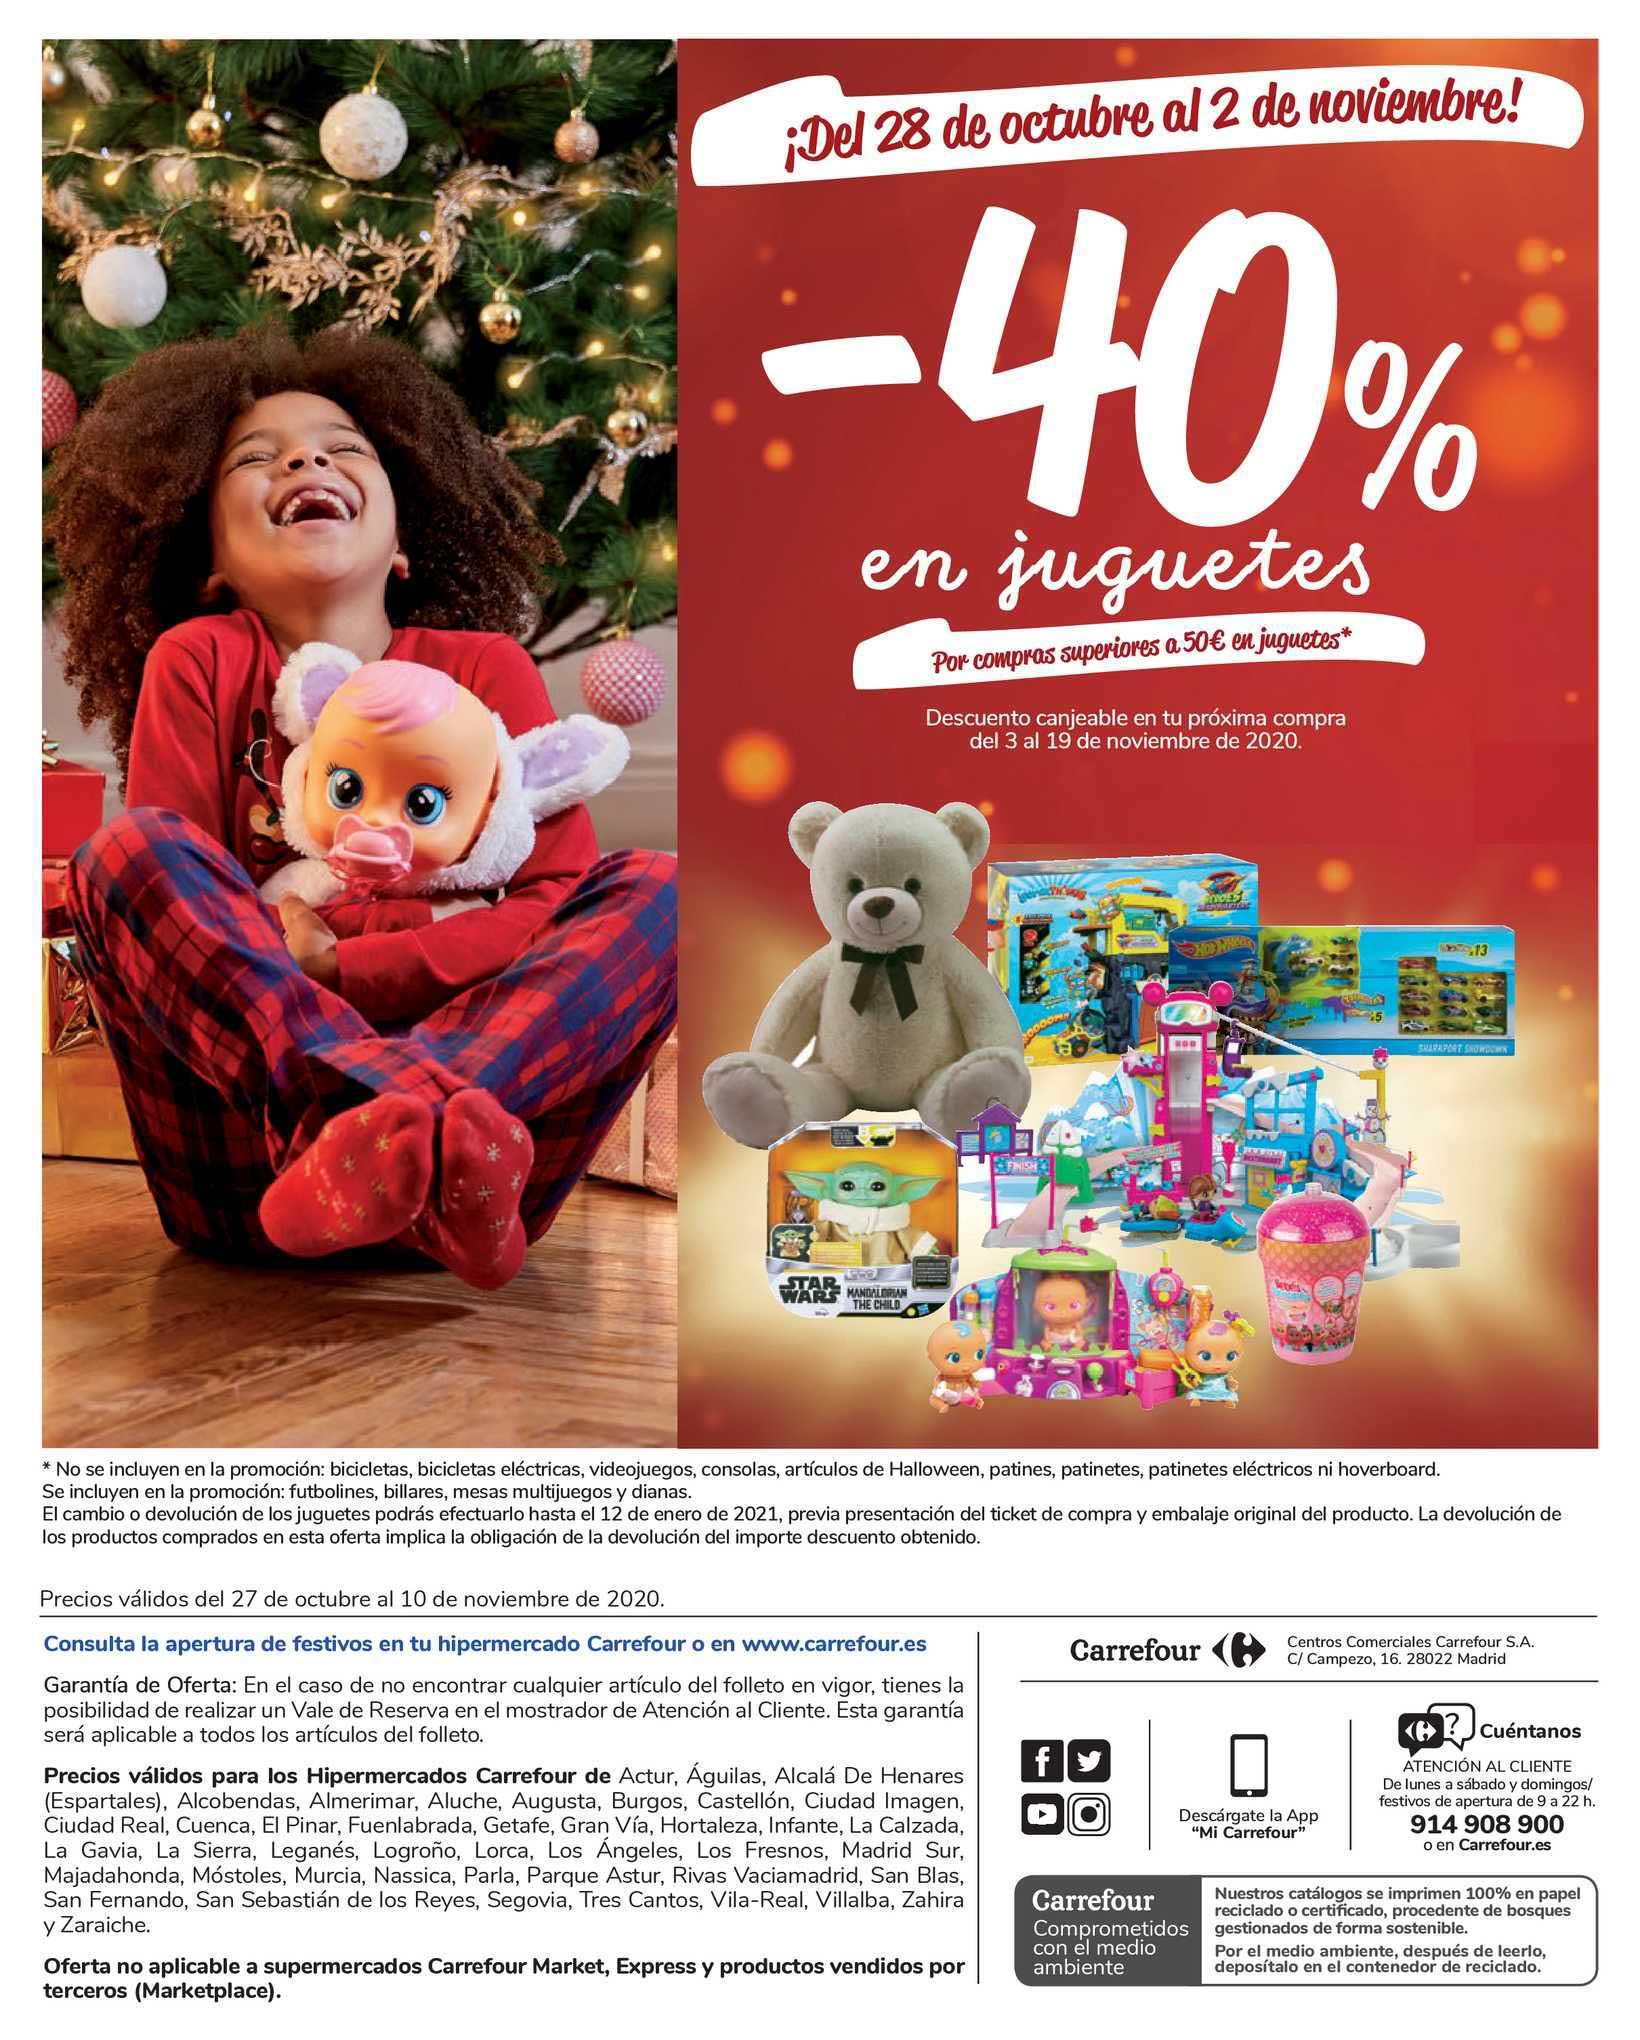 Carrefour -40% En Juguetes